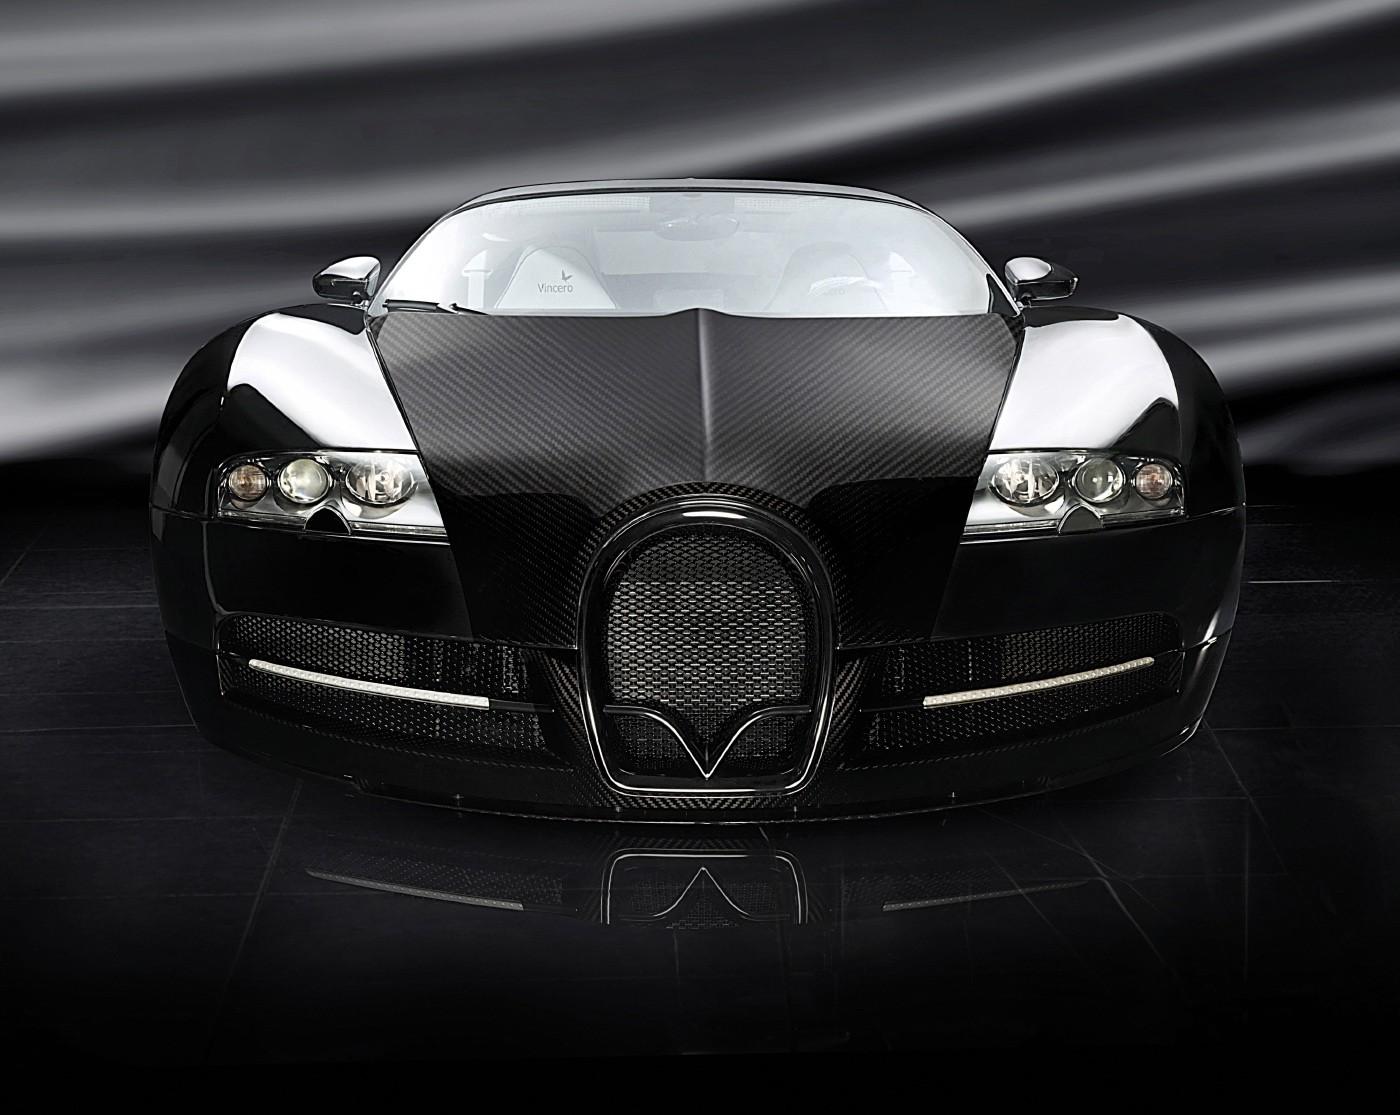 mansory tuned linea vincero bugatti veyron. Black Bedroom Furniture Sets. Home Design Ideas